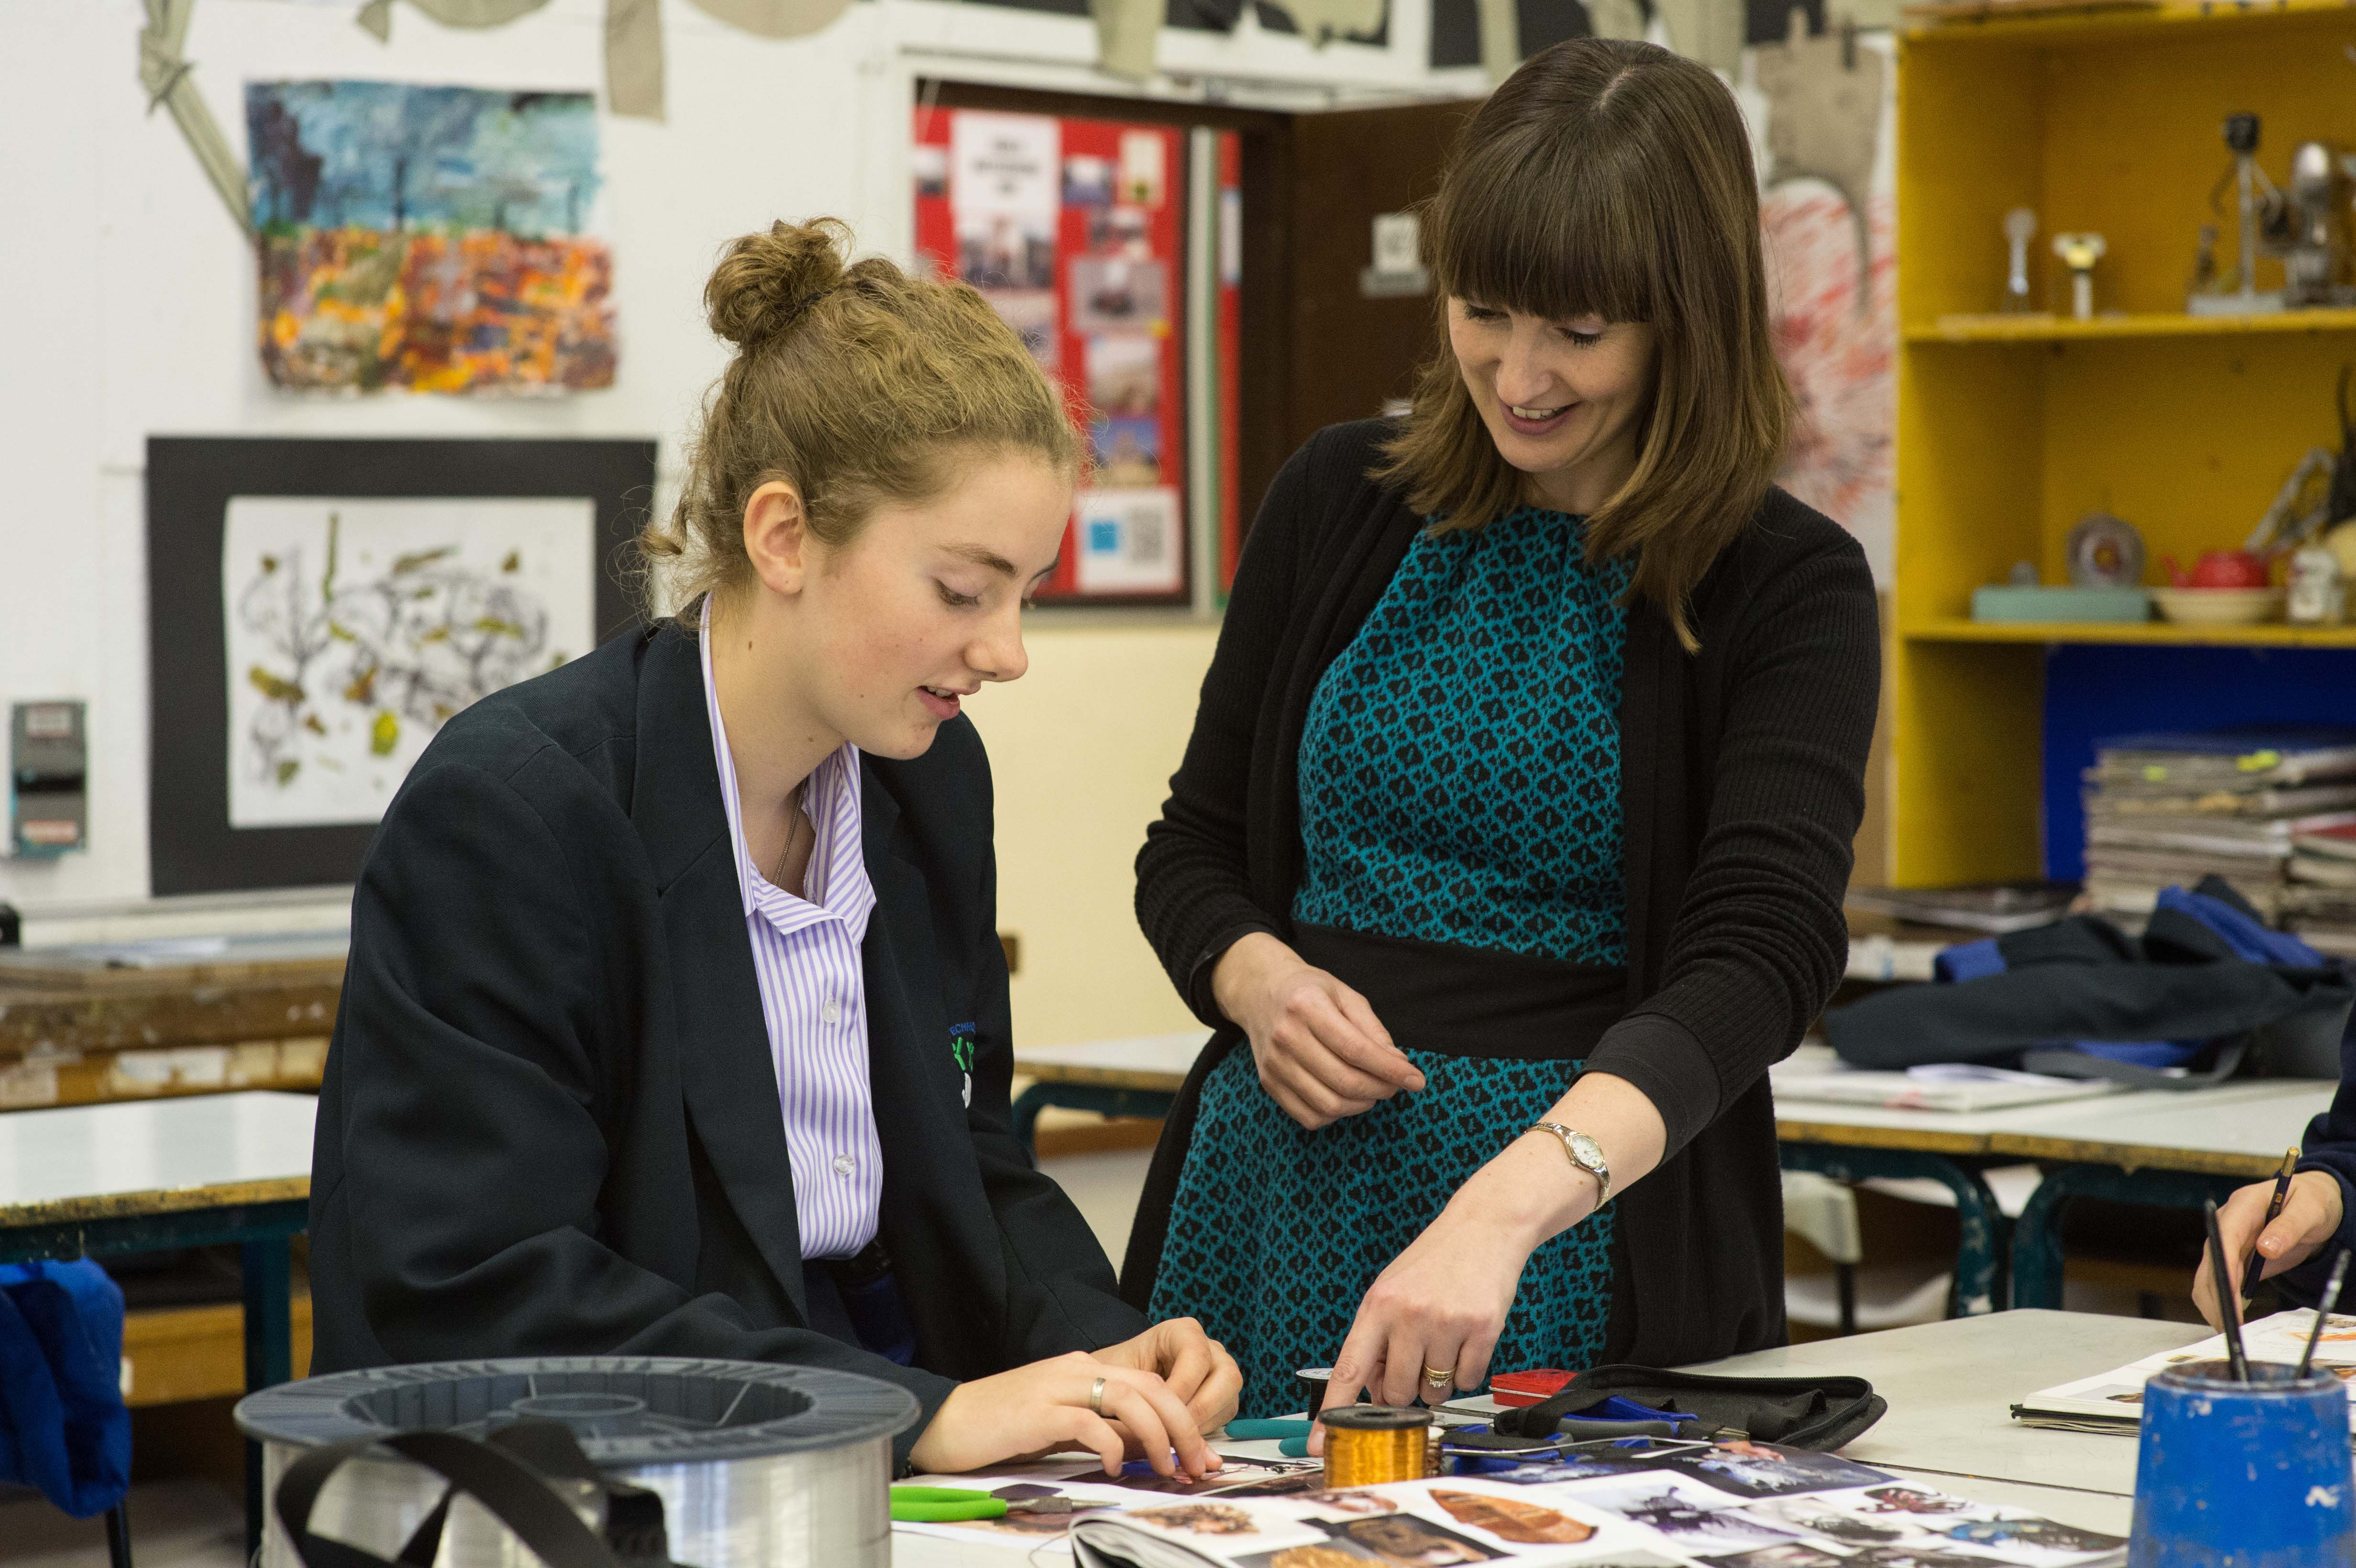 Teacher and student art